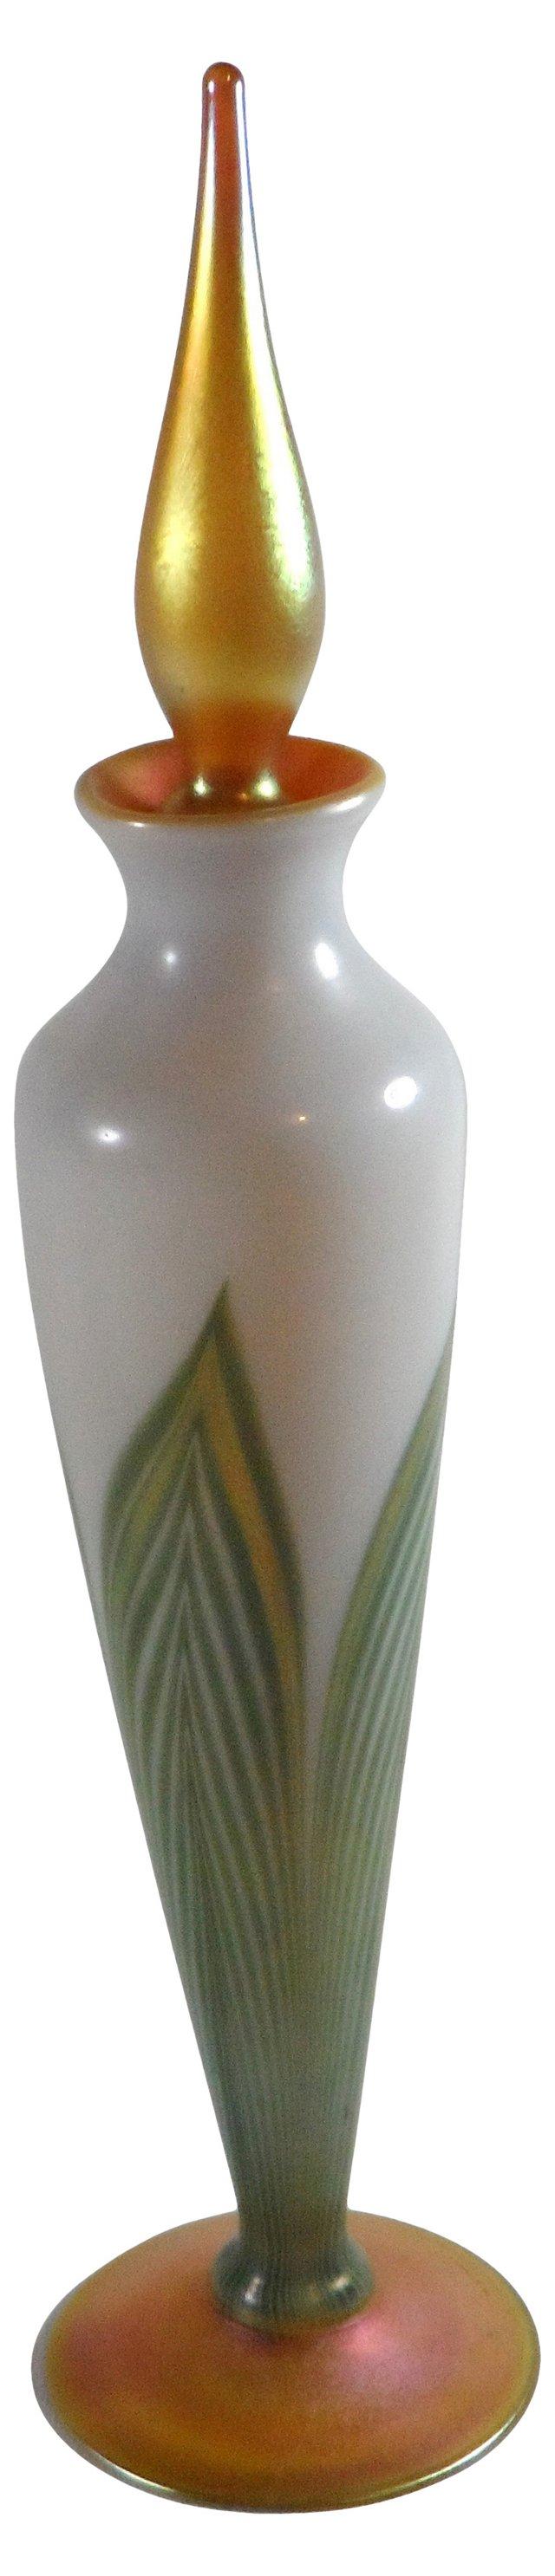 Tiffany Favrile Glass Bottle, Signed